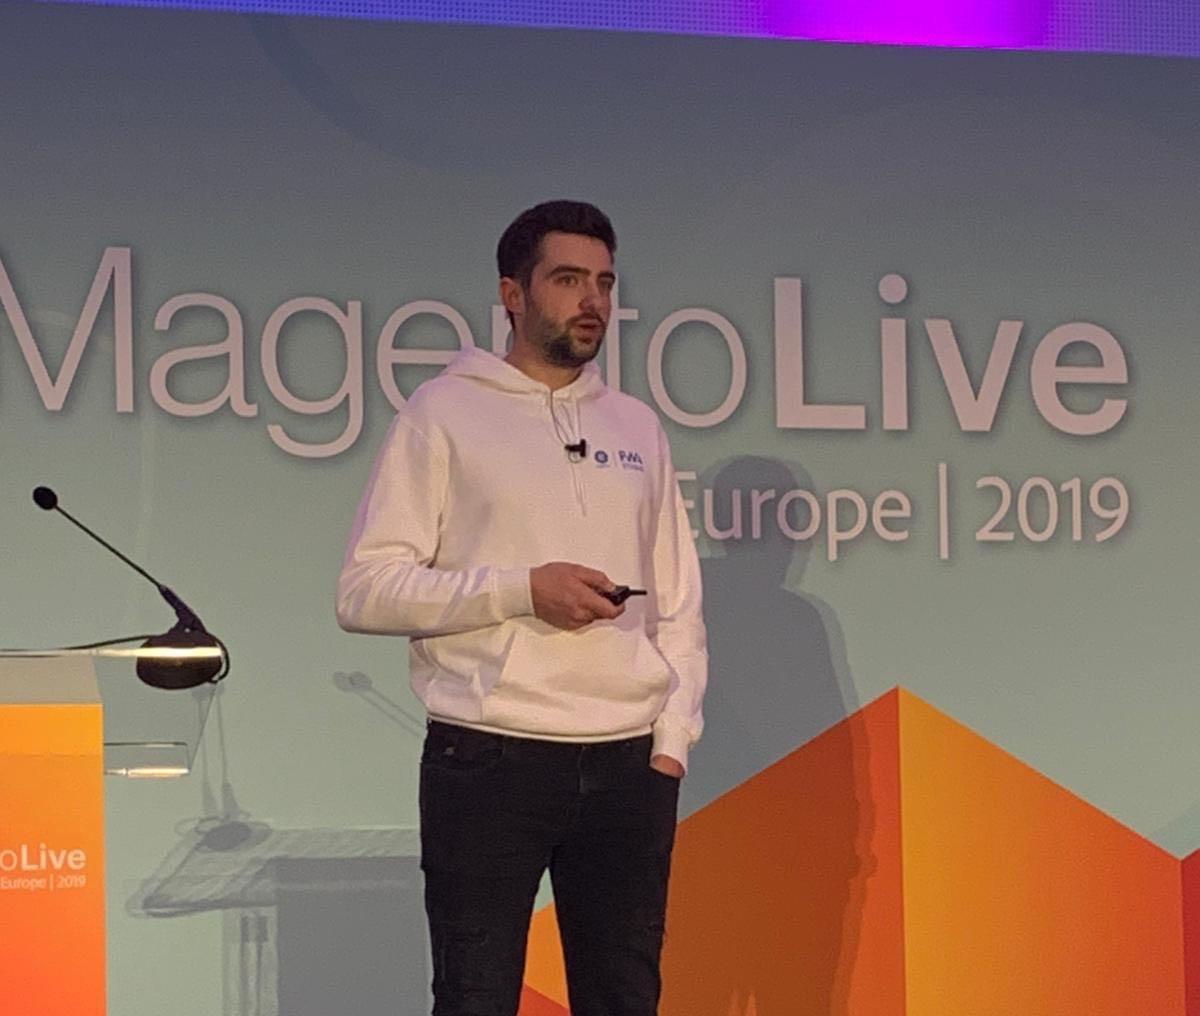 Magento Live Europe 2019 - Jordan presentatie - square